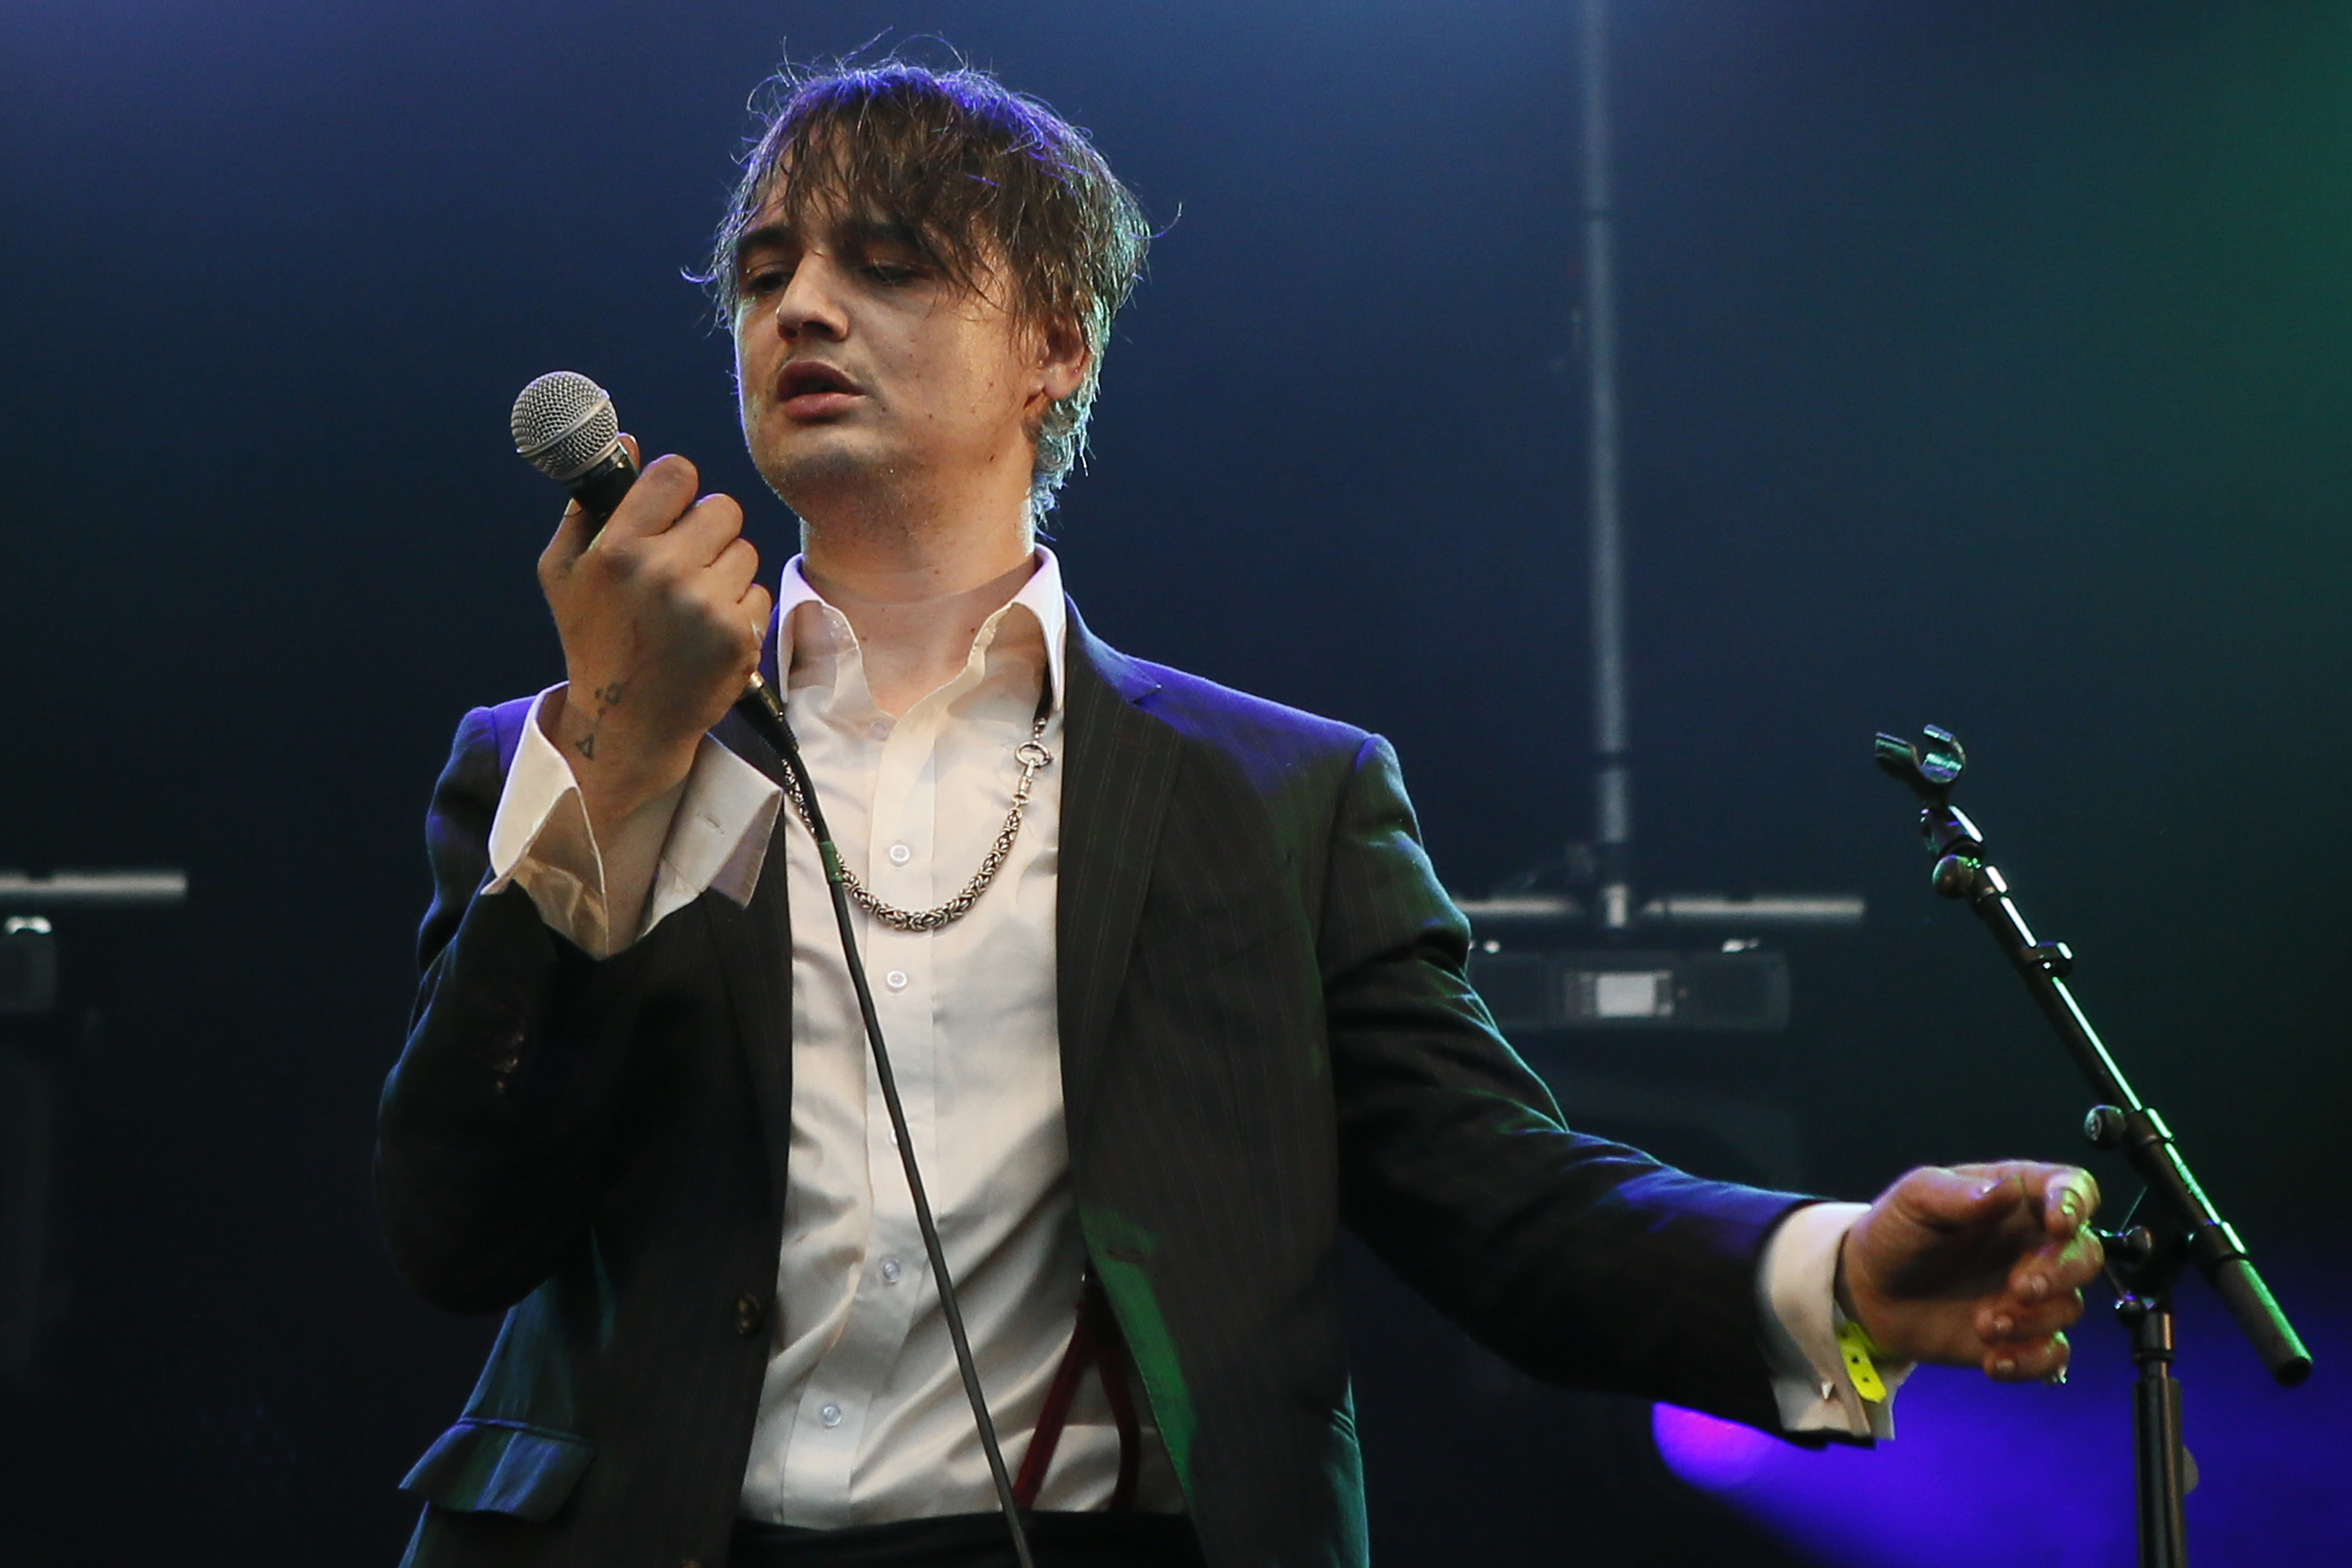 Pete Doherty arrested in France amid drug sale allegations